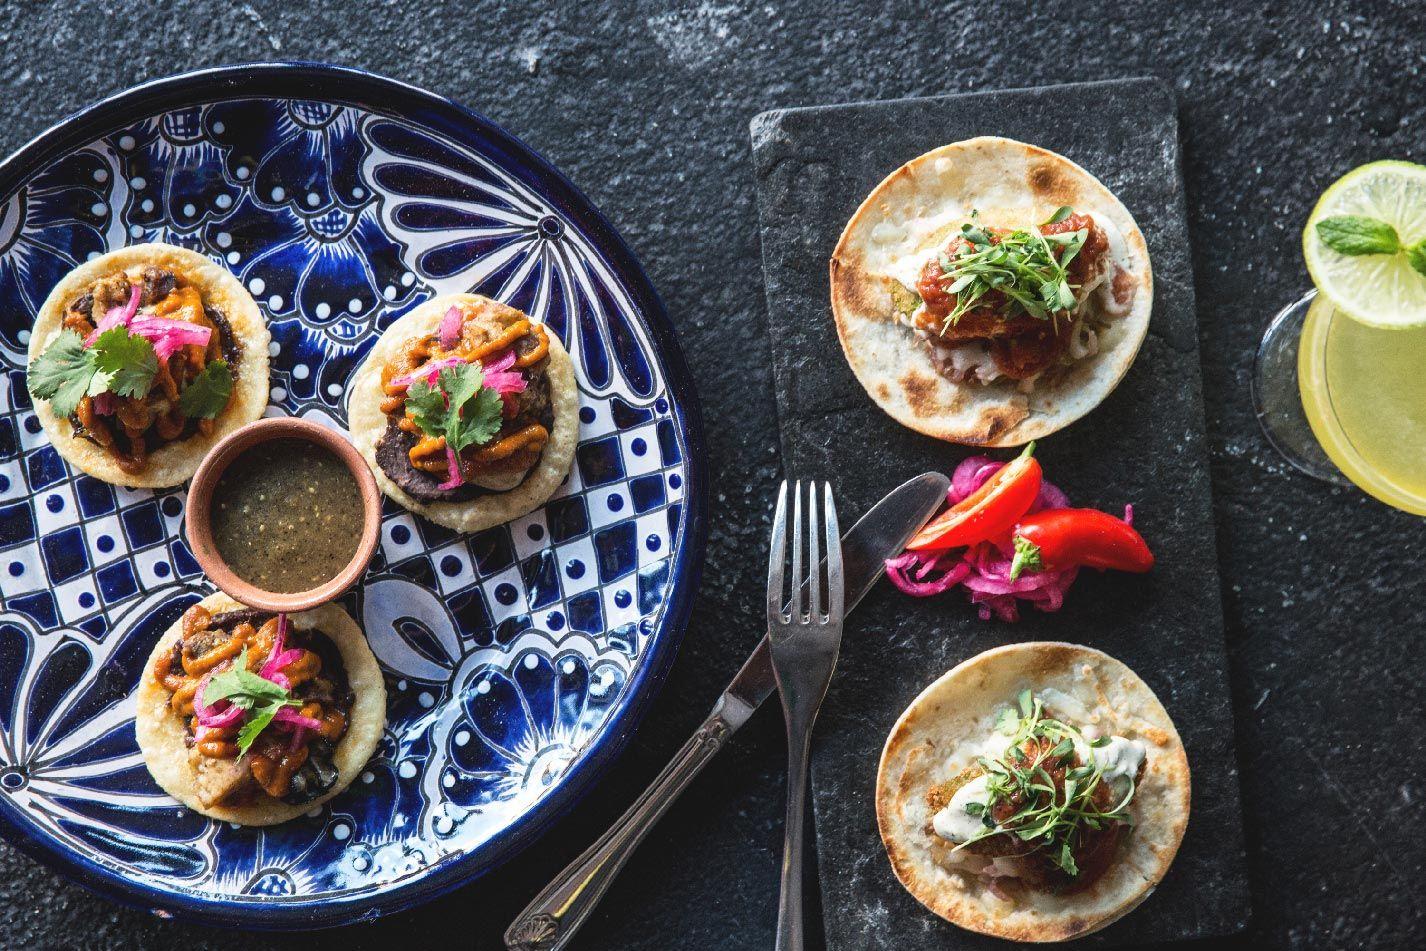 Lolo mexican tapas mission california food avocado